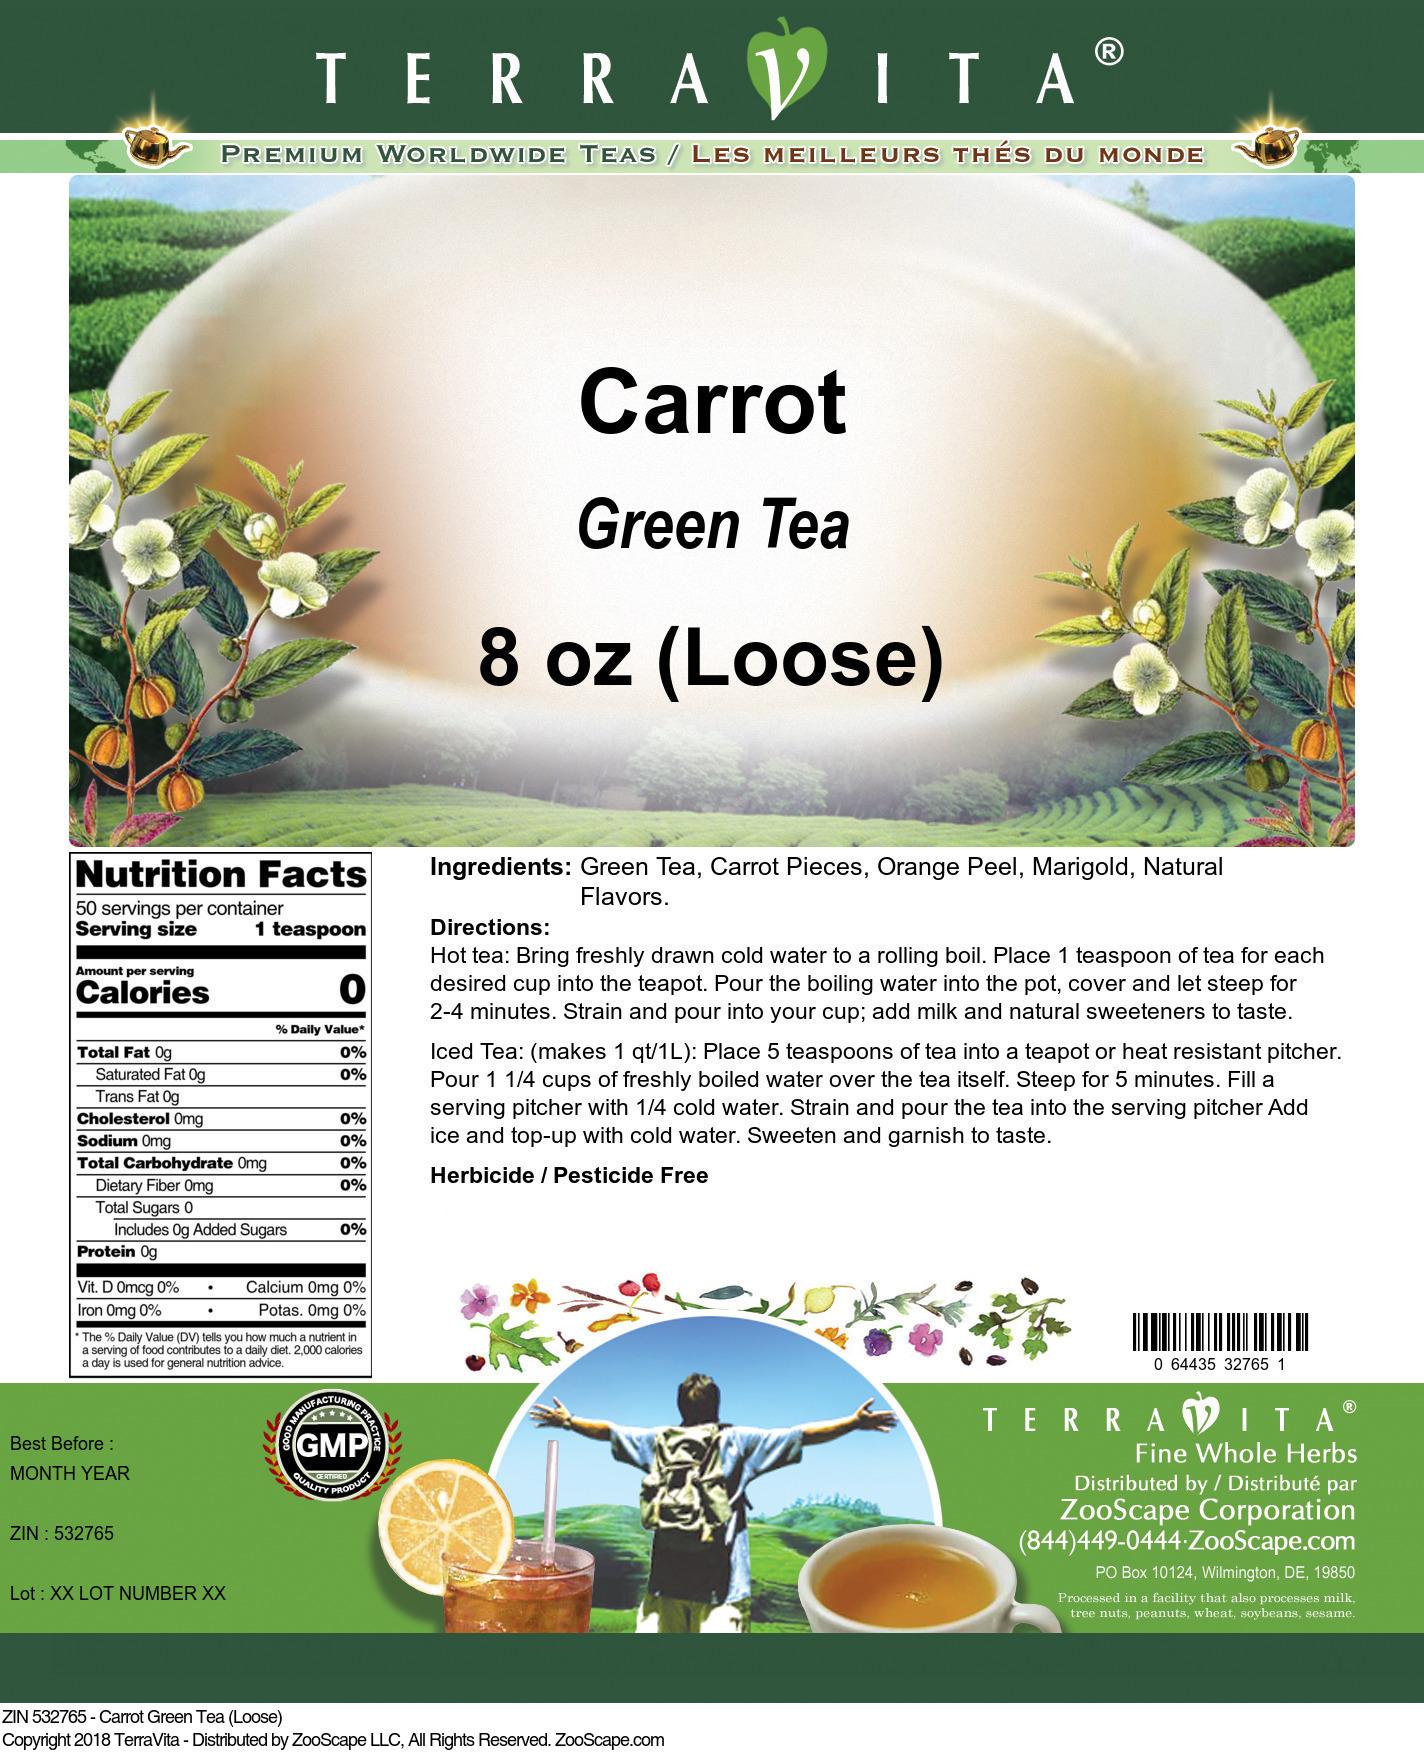 Carrot Green Tea (Loose)